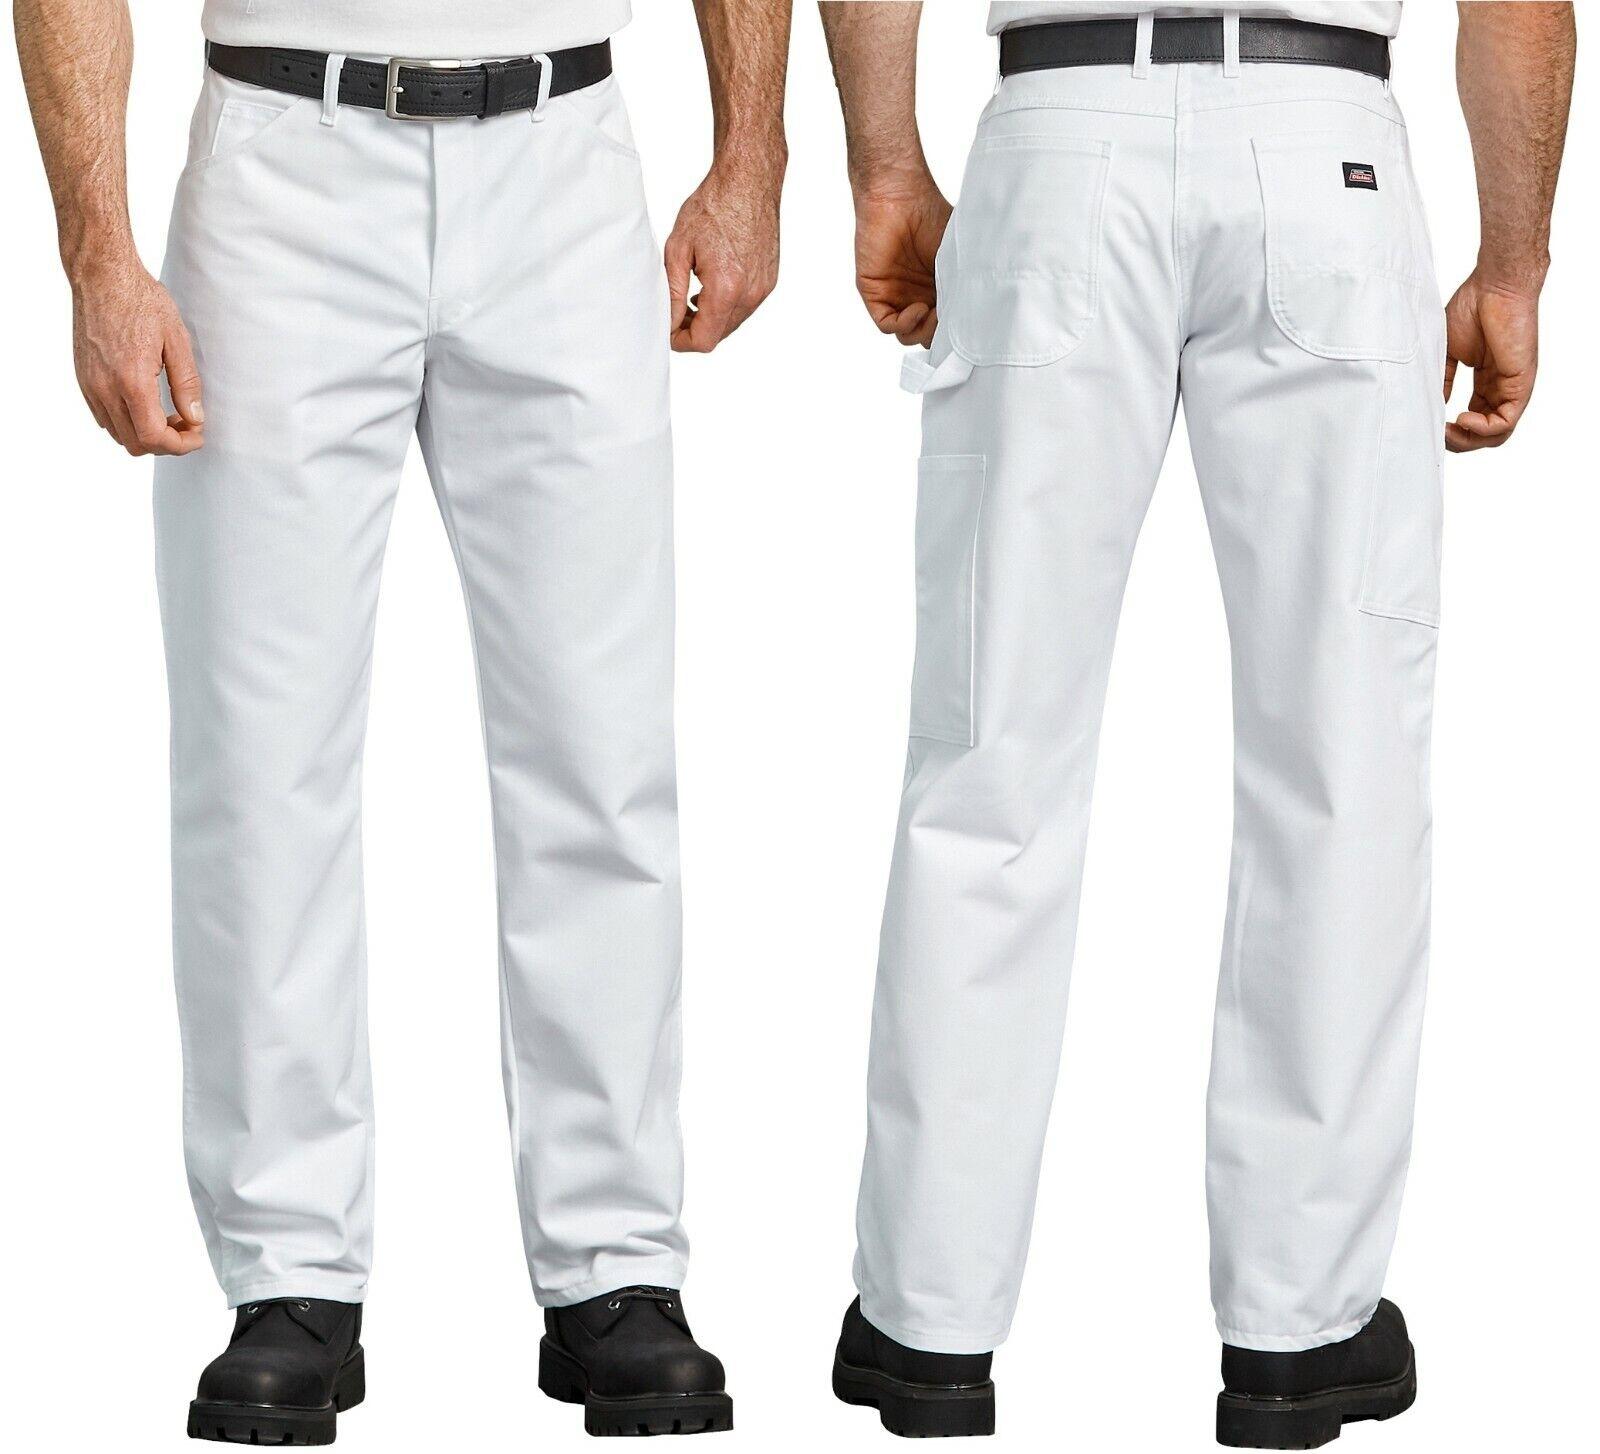 Genuine Dickies Men's Painter Pant